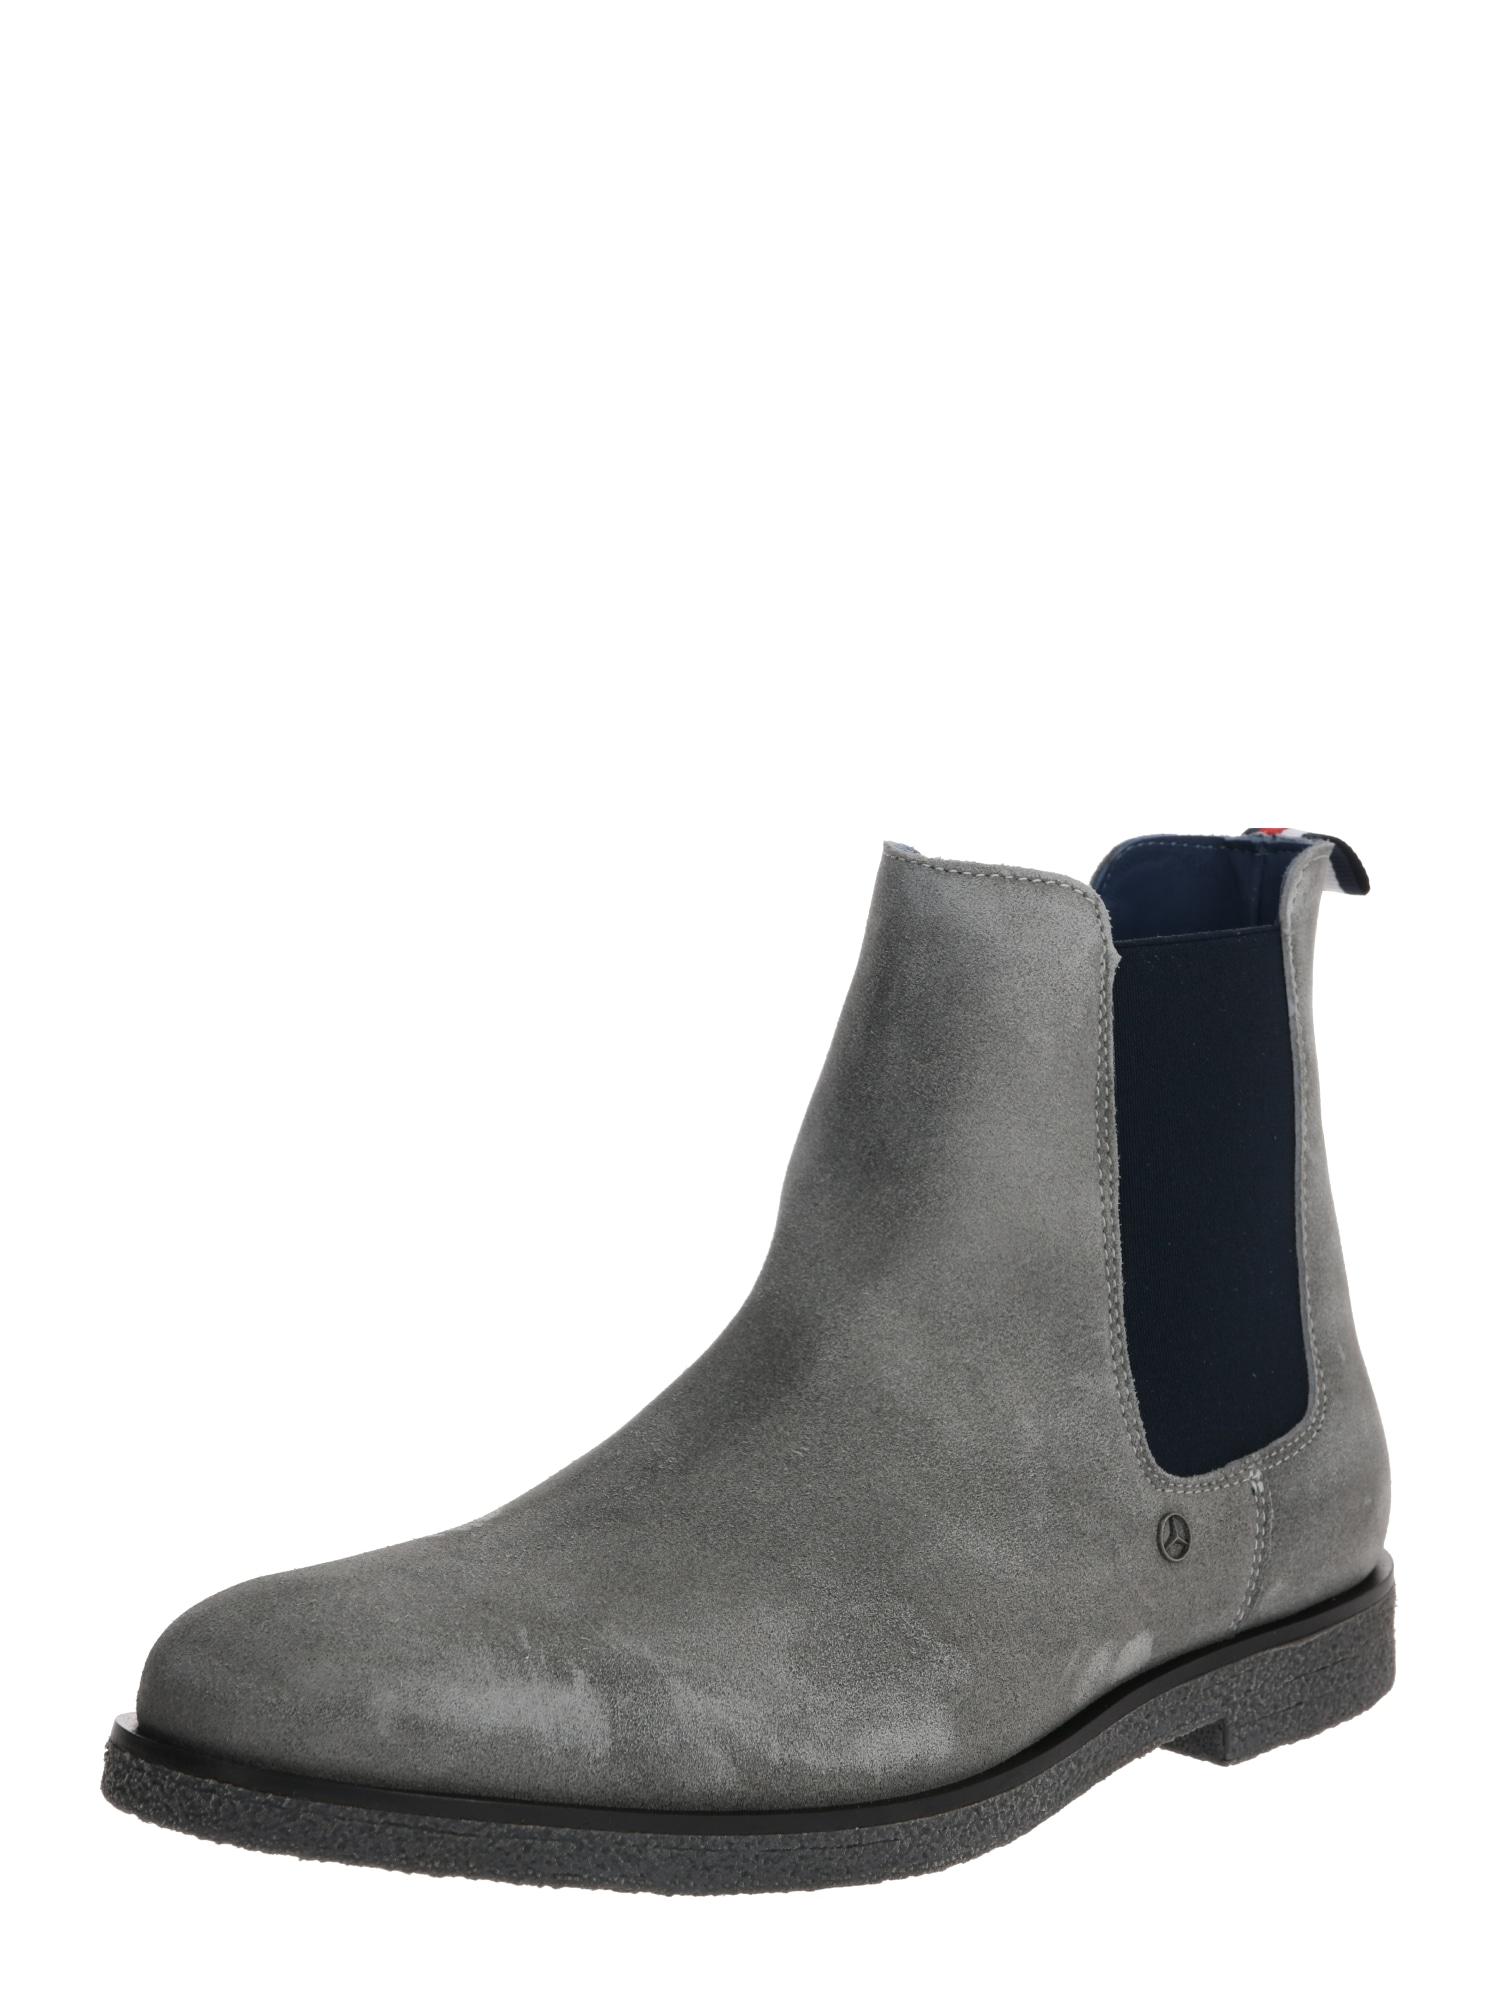 TOMMY HILFIGER Chelsea batai šviesiai pilka